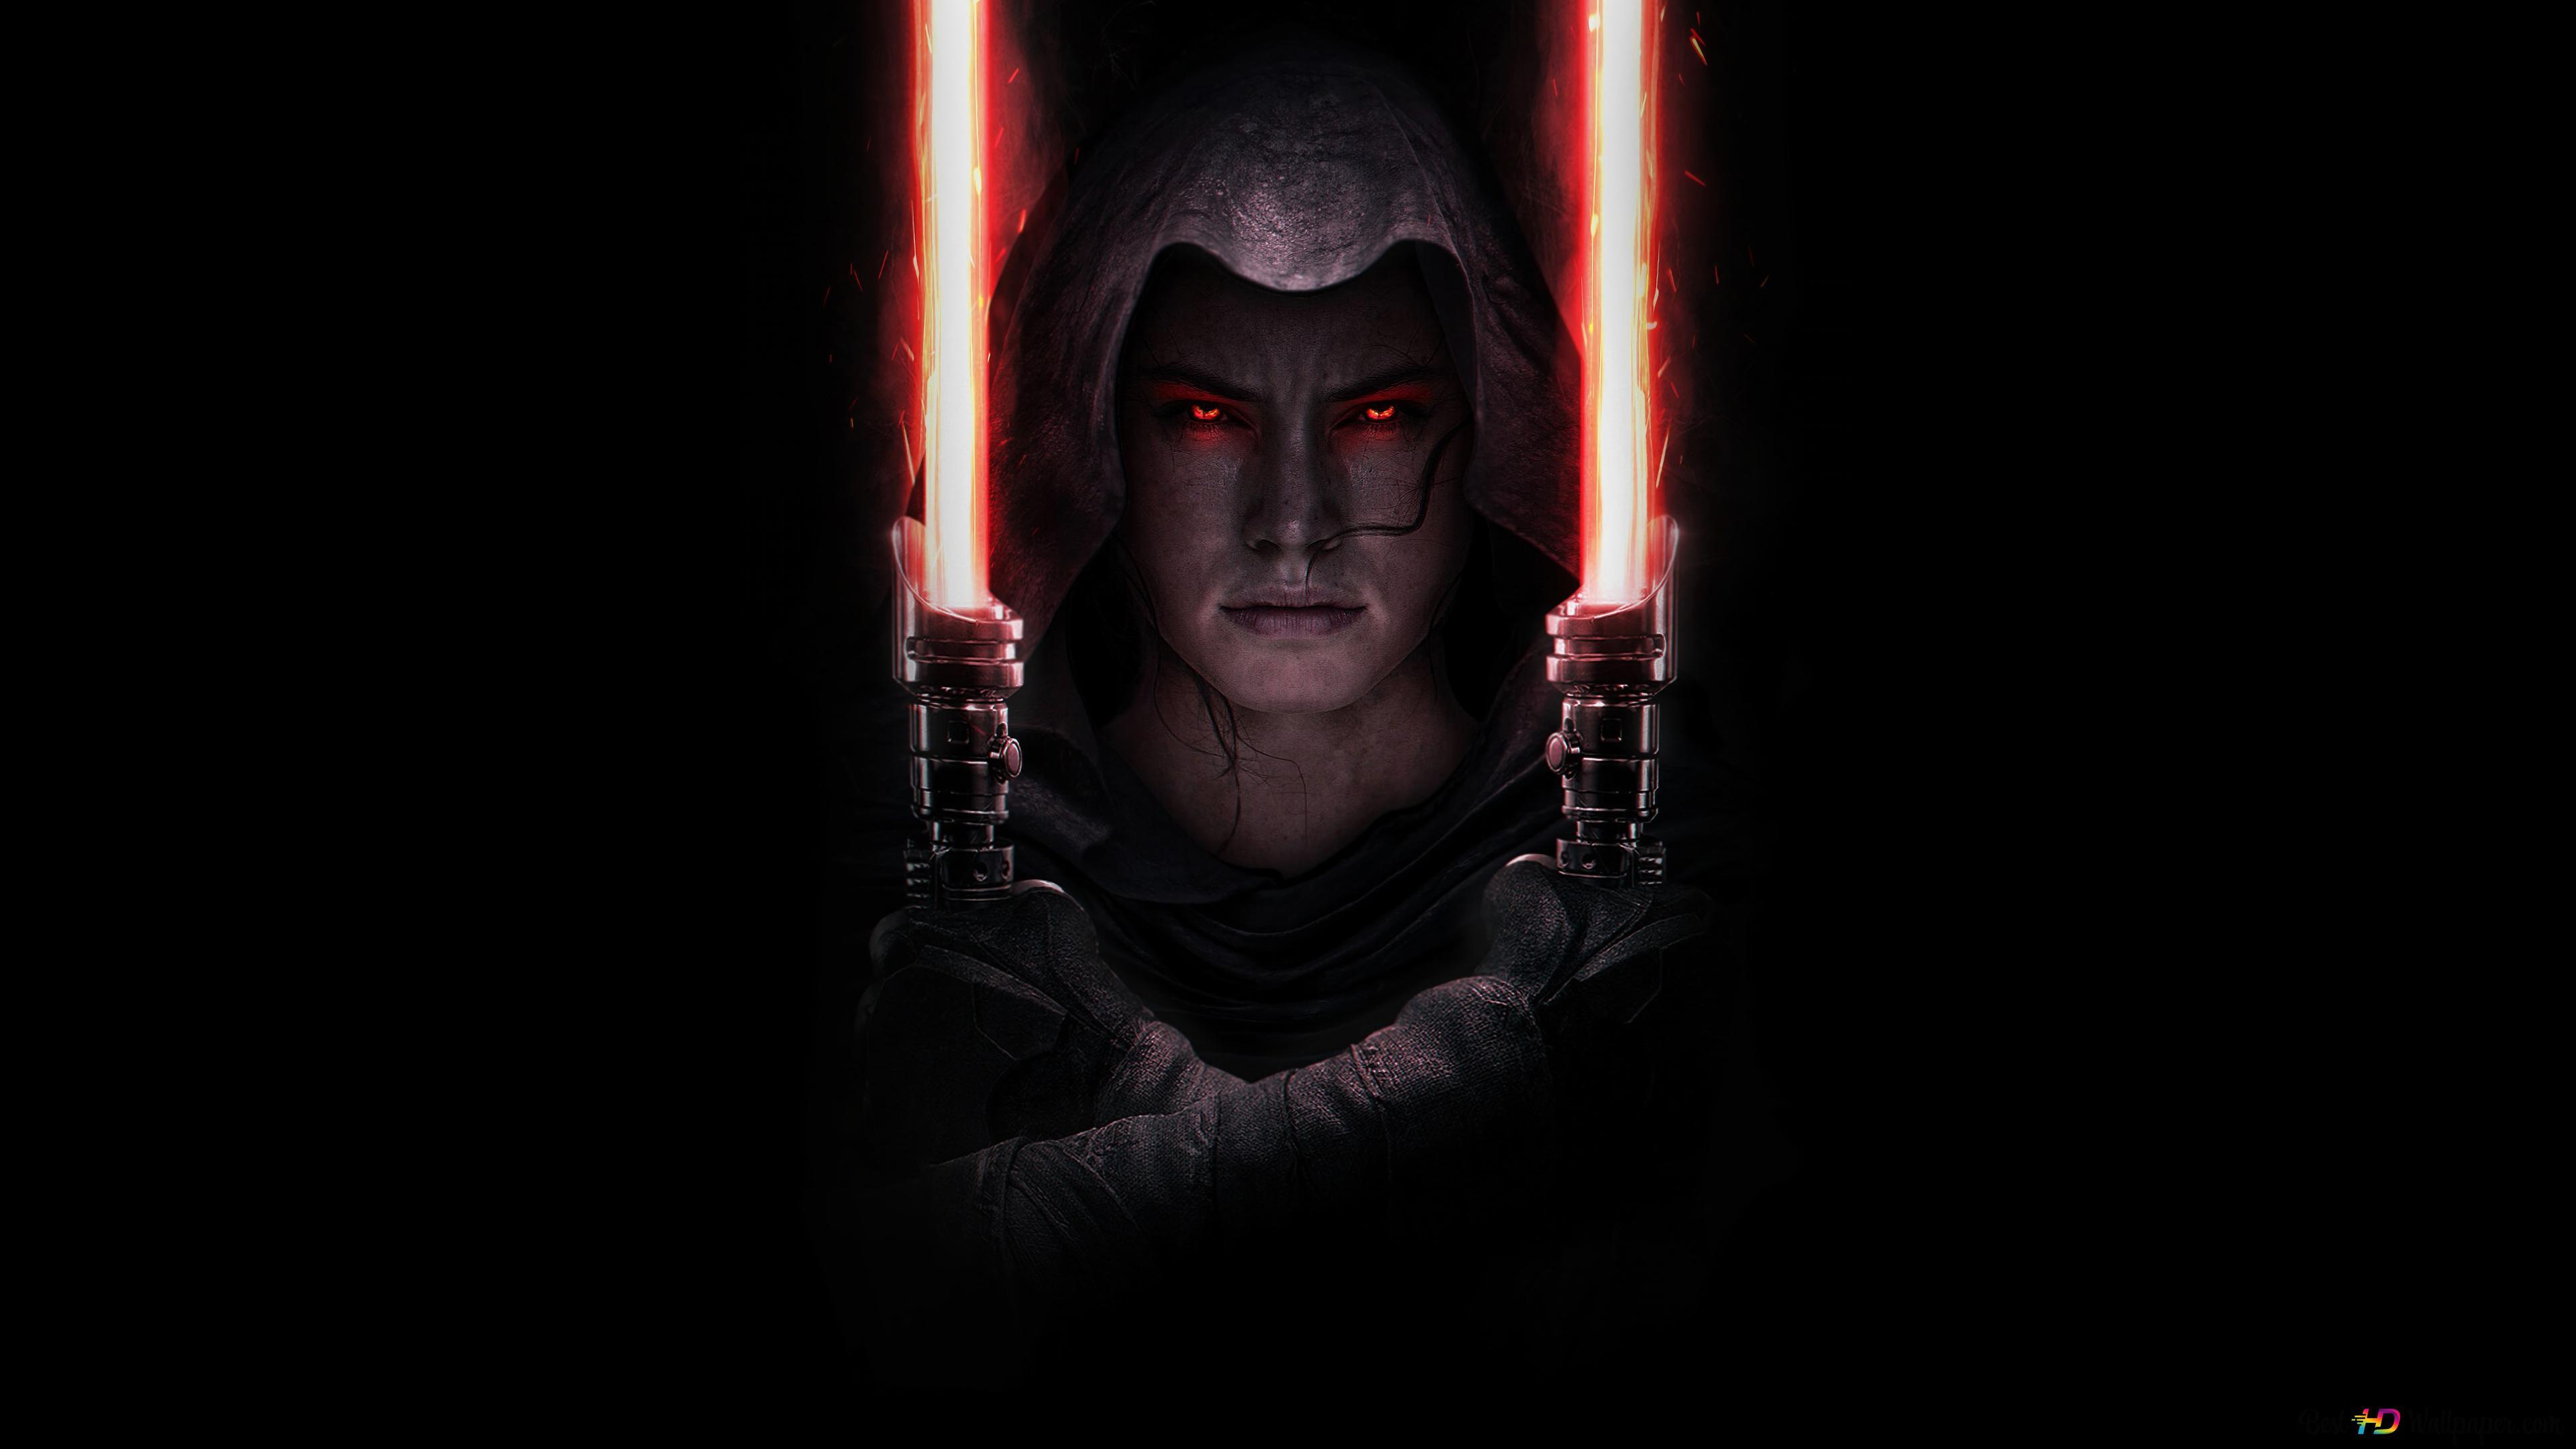 Star Wars Rey Gelap Sisi 9 Unduhan Wallpaper Hd